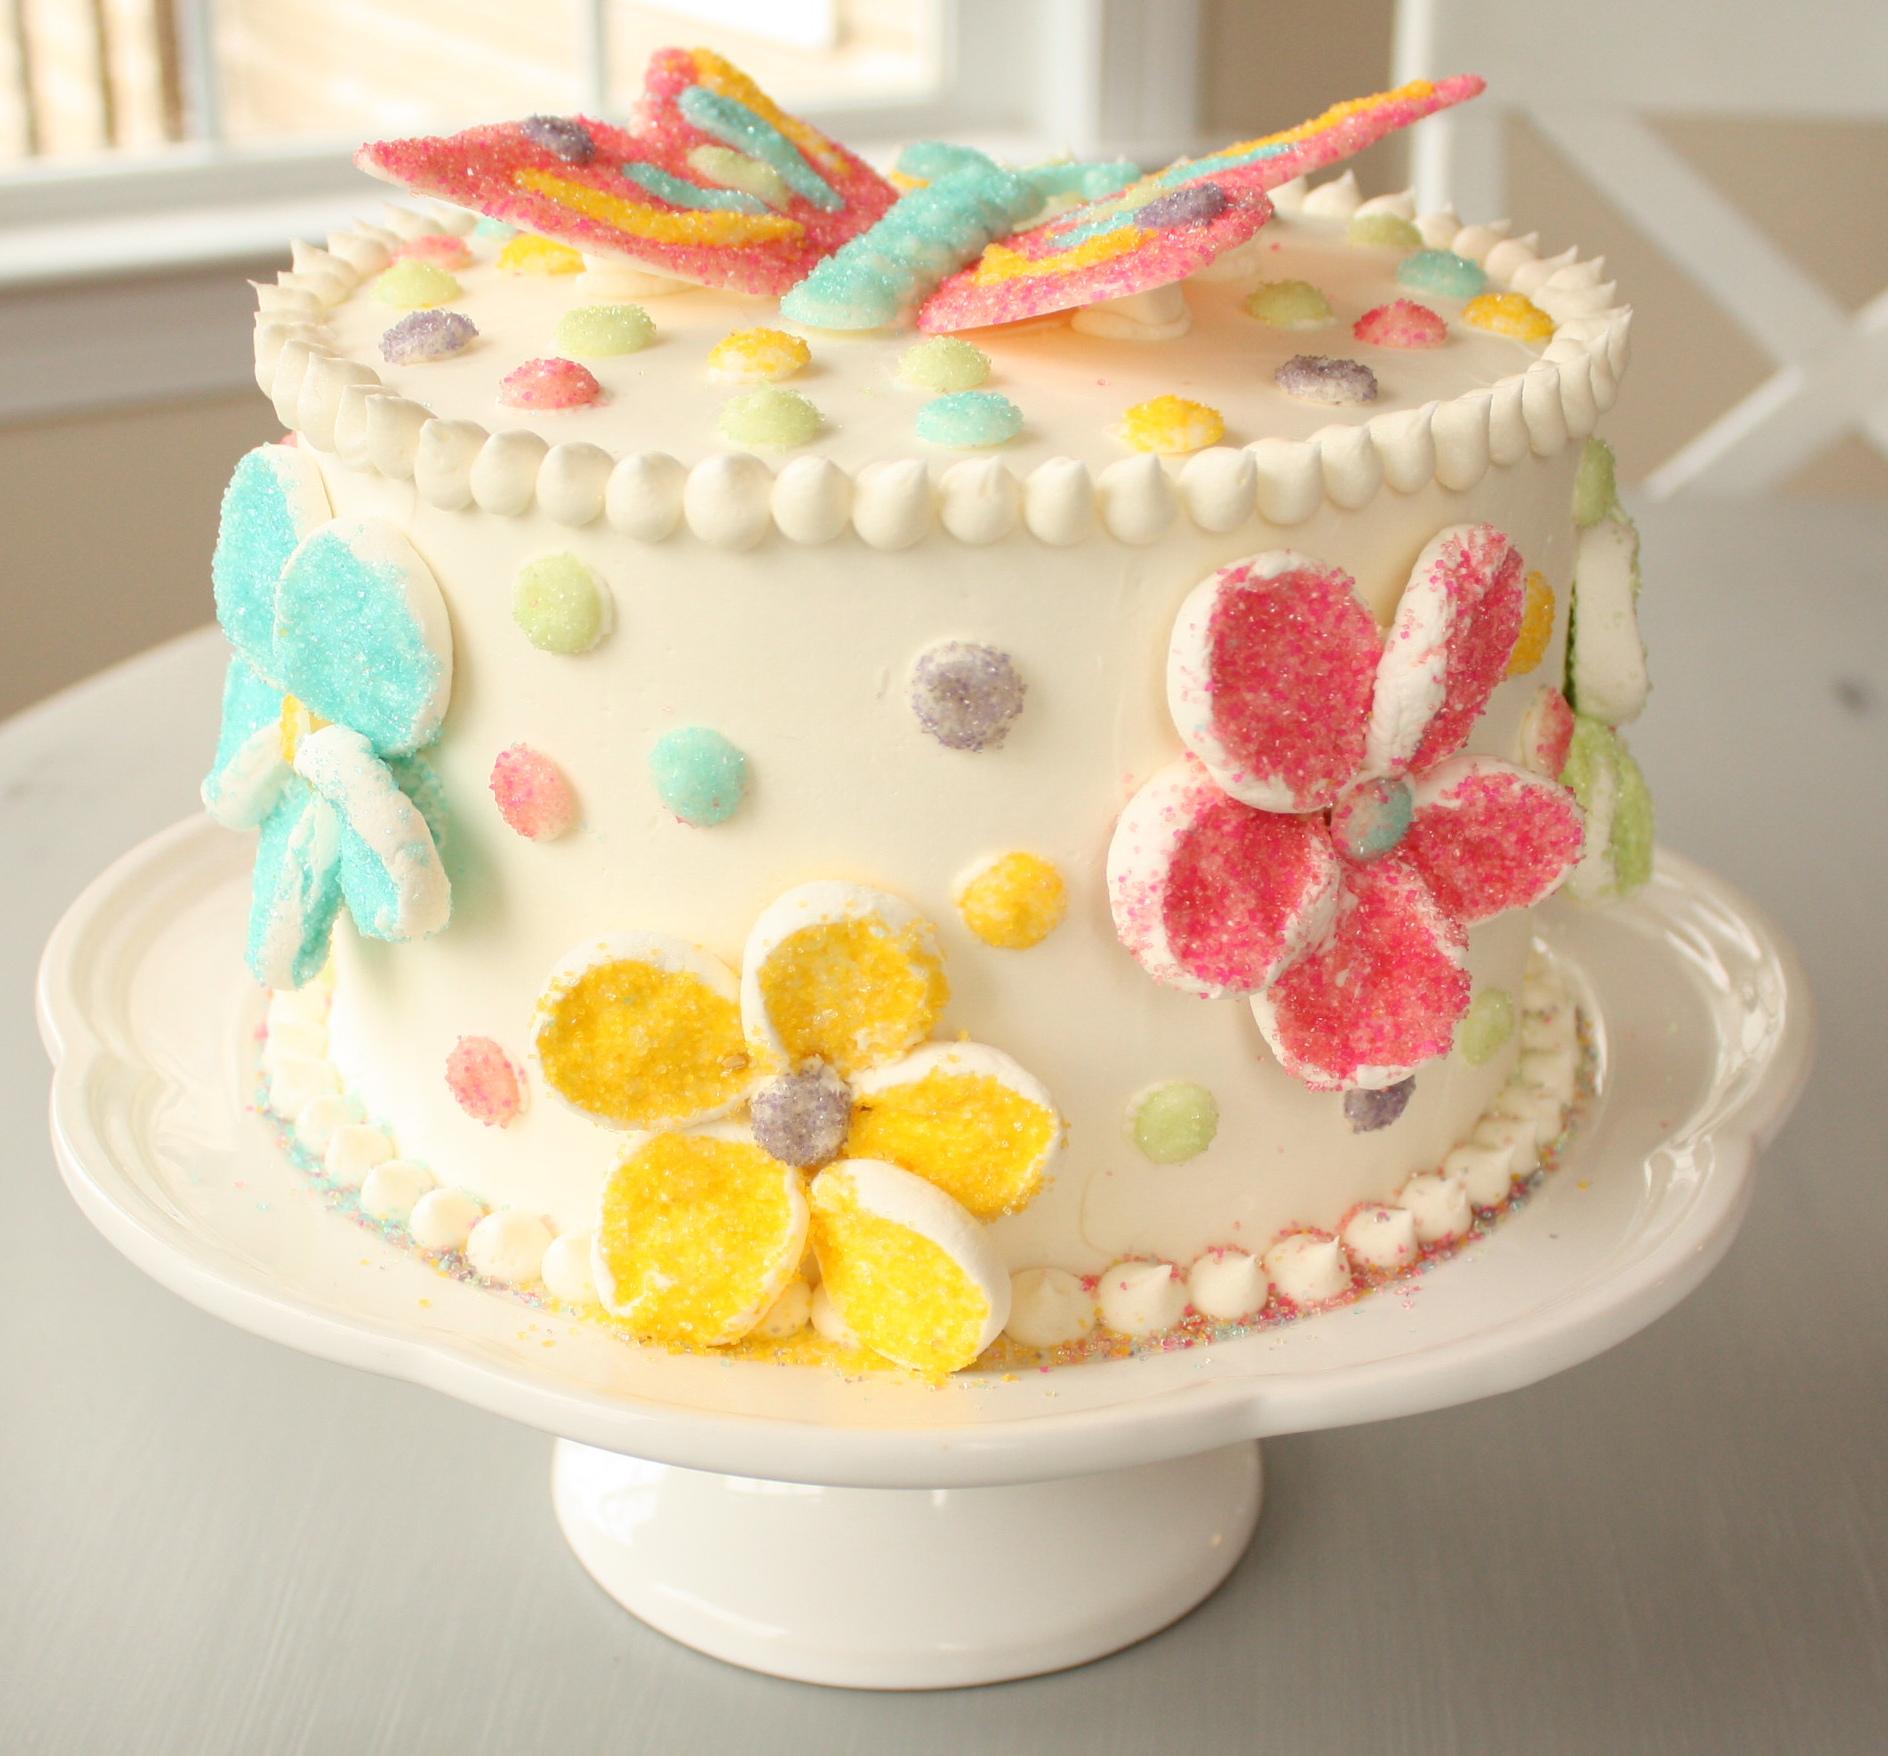 Terrific The Long Awaited Butterfly Cake 7 Layer Studio Funny Birthday Cards Online Kookostrdamsfinfo